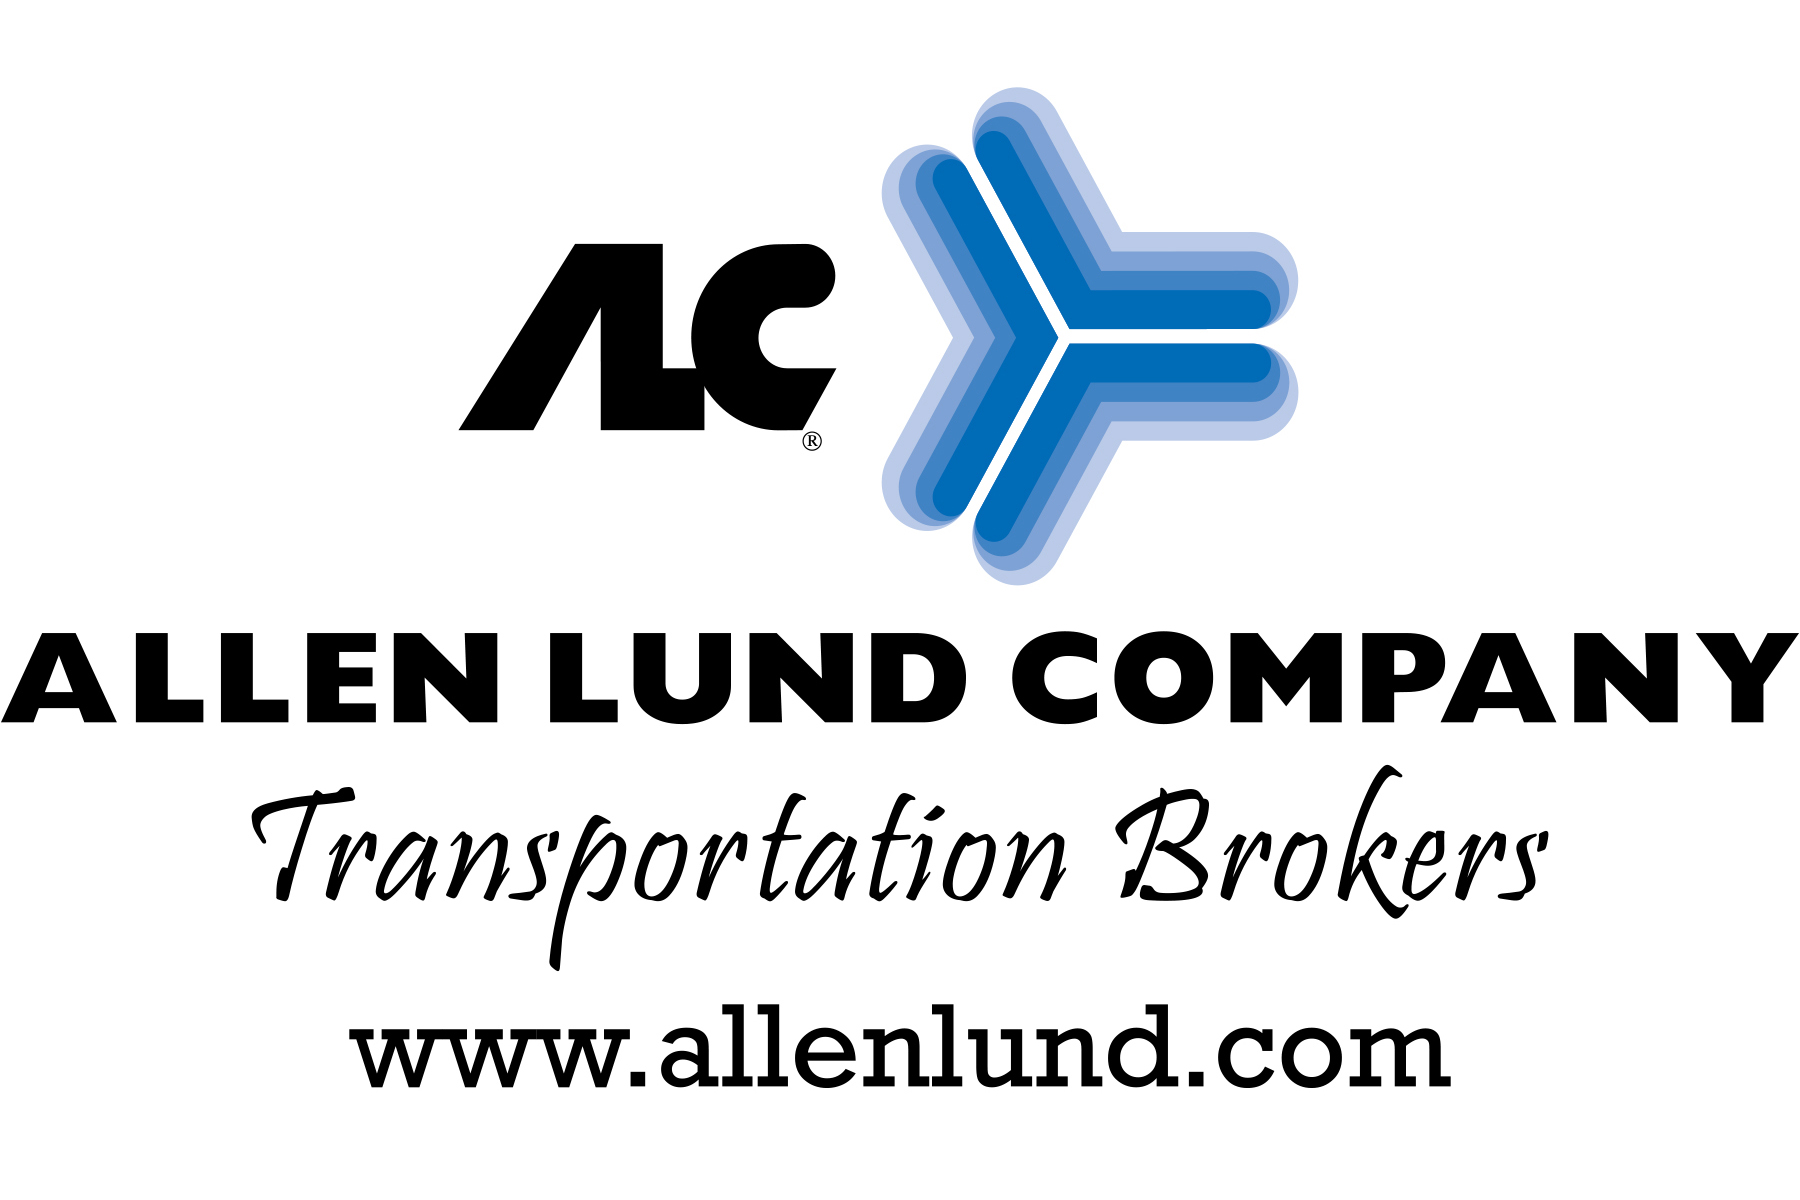 Allen Lund Company